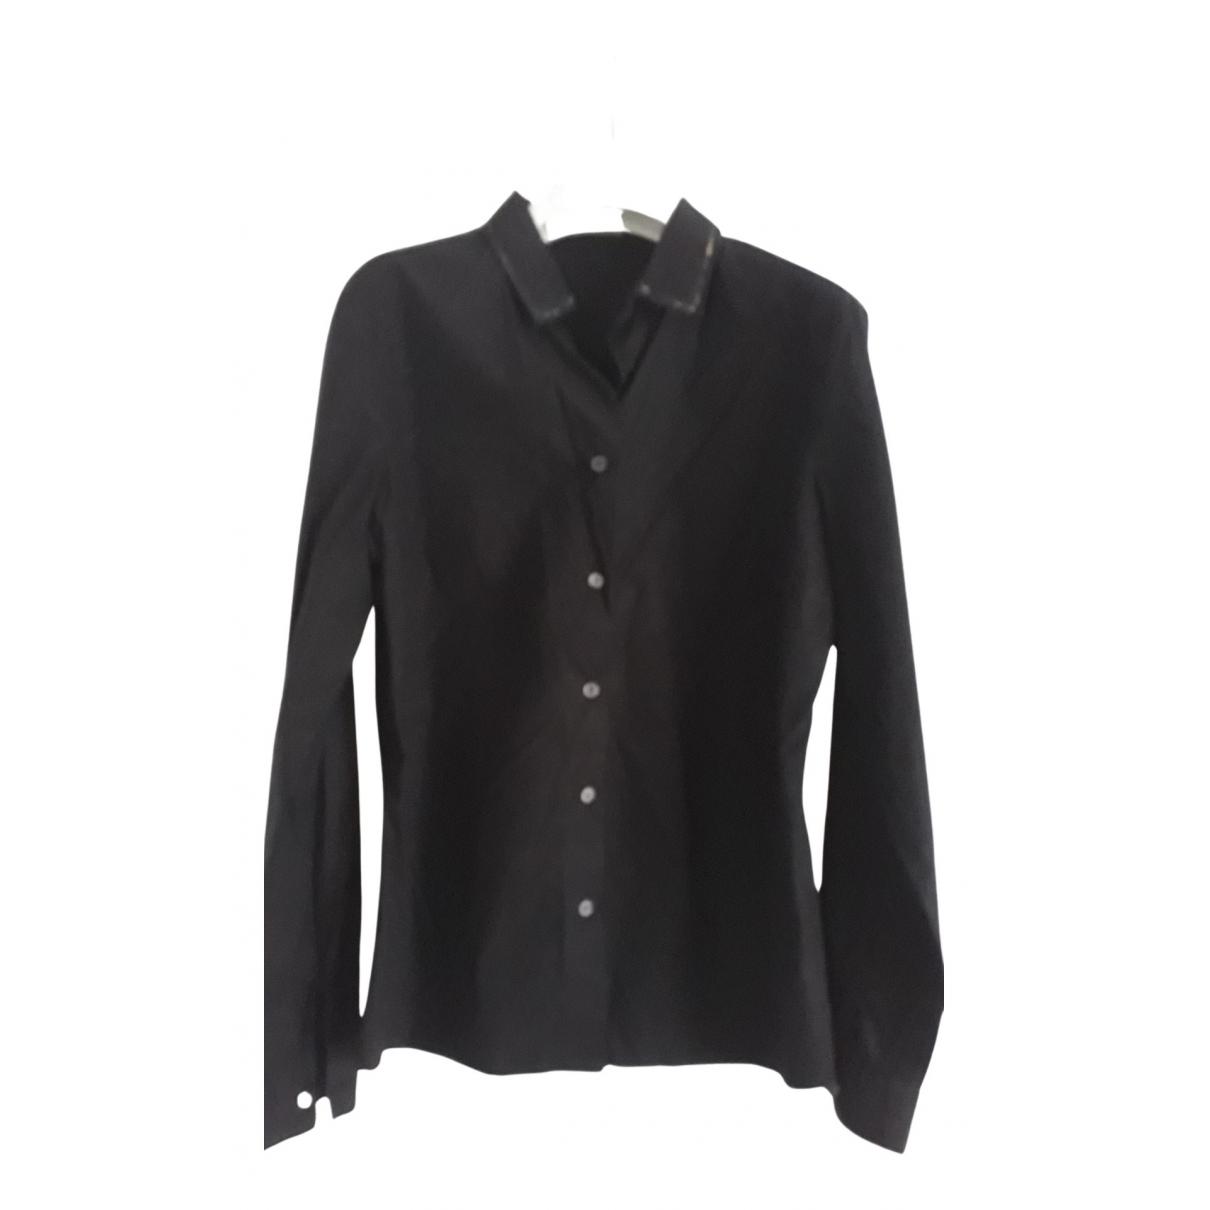 Bottega Veneta - Top   pour femme en coton - noir